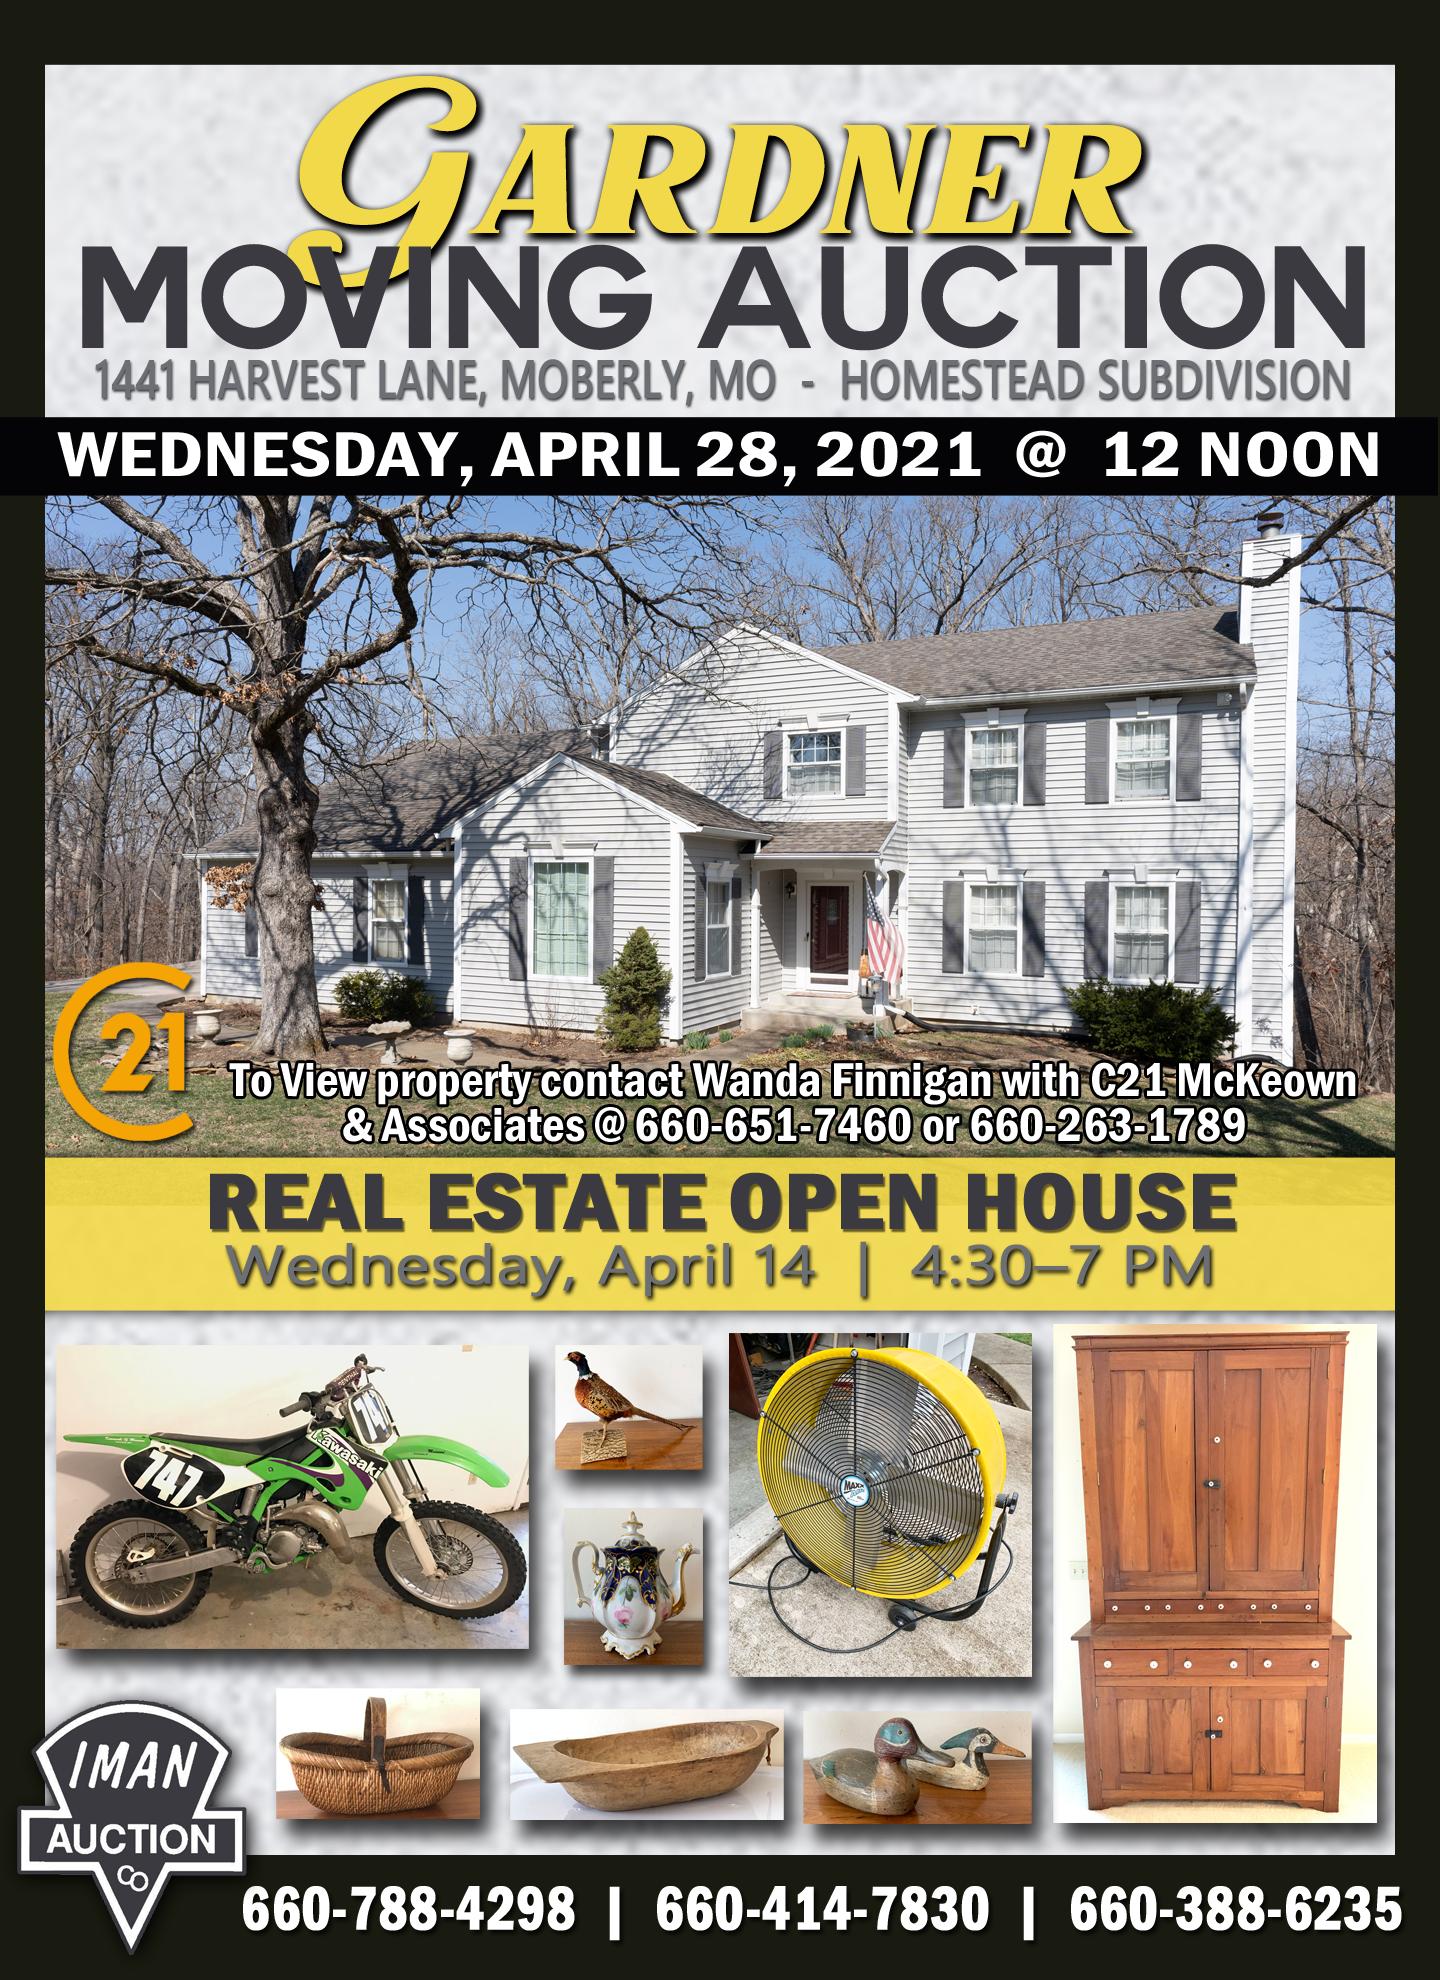 GARDNER MOVING AUCTION